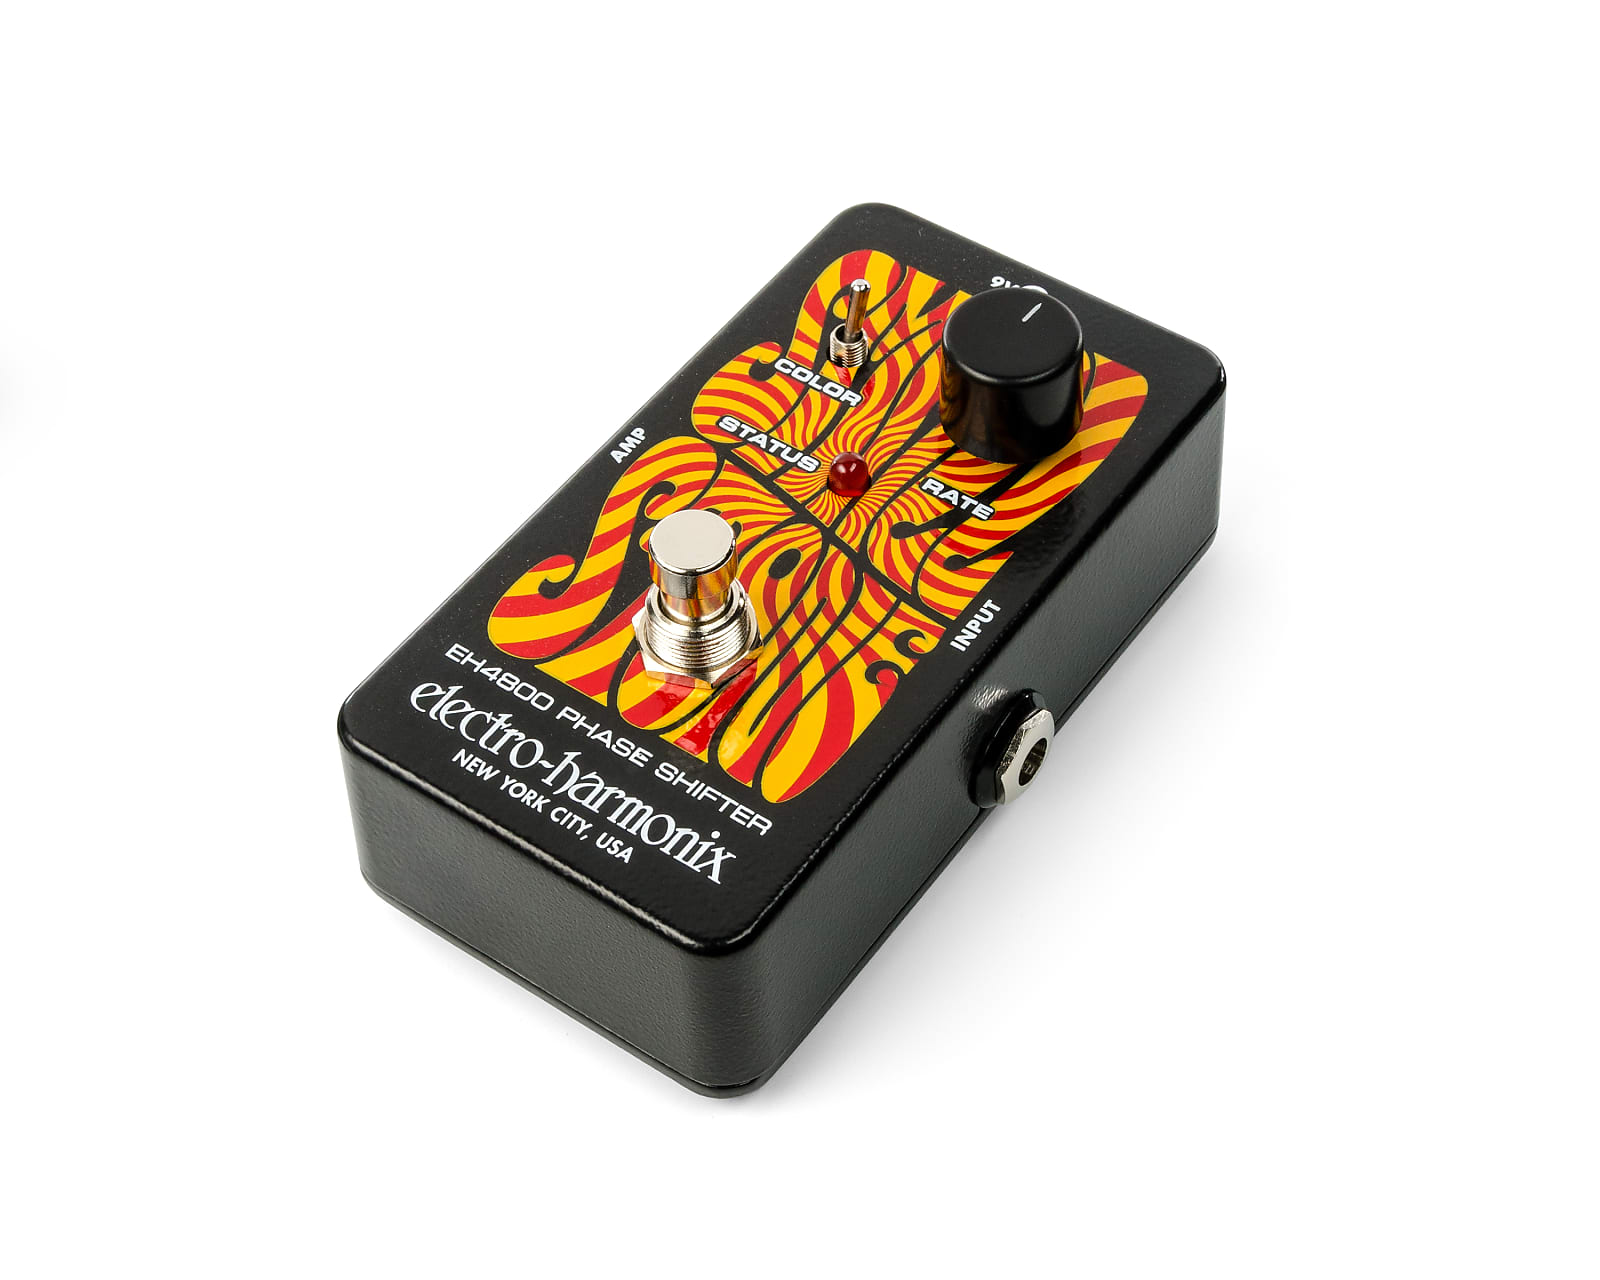 Electro-Harmonix EHX Small Stone Analog Phase Shifter Effects Pedal